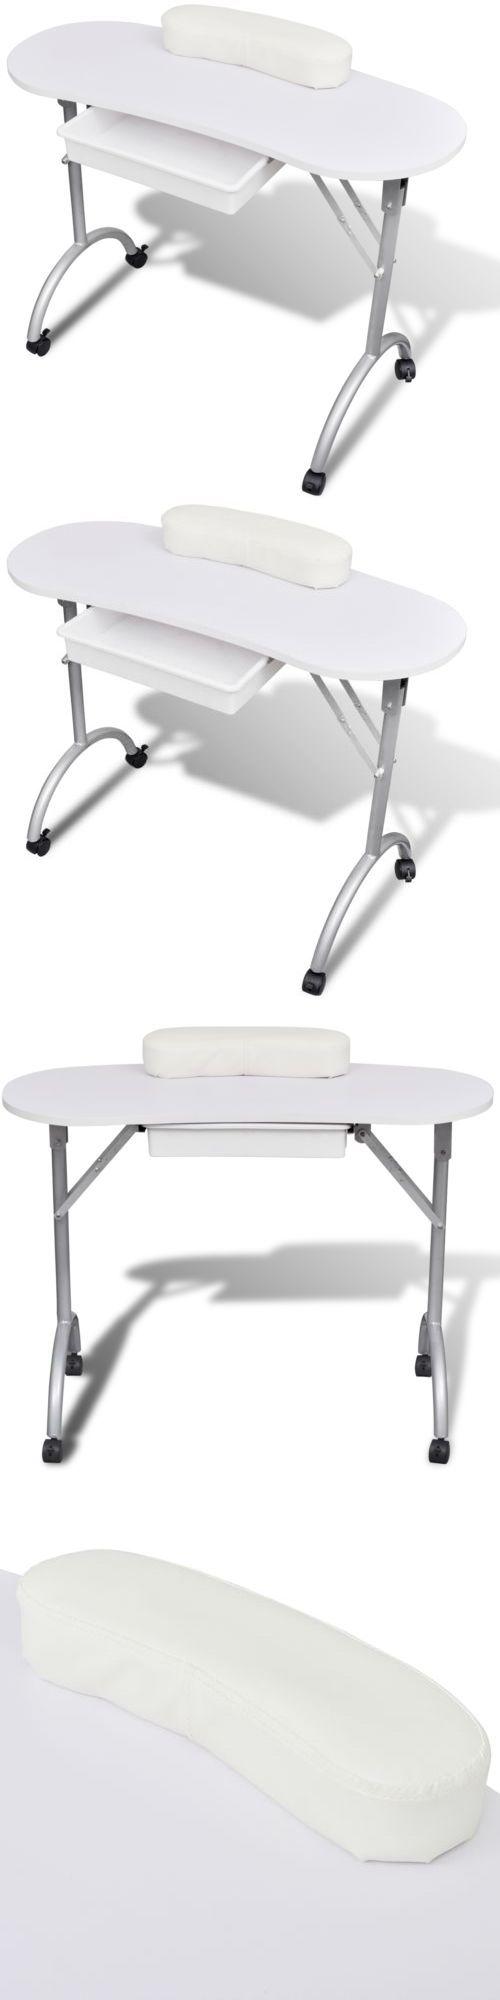 25  best ideas about salon equipment on pinterest